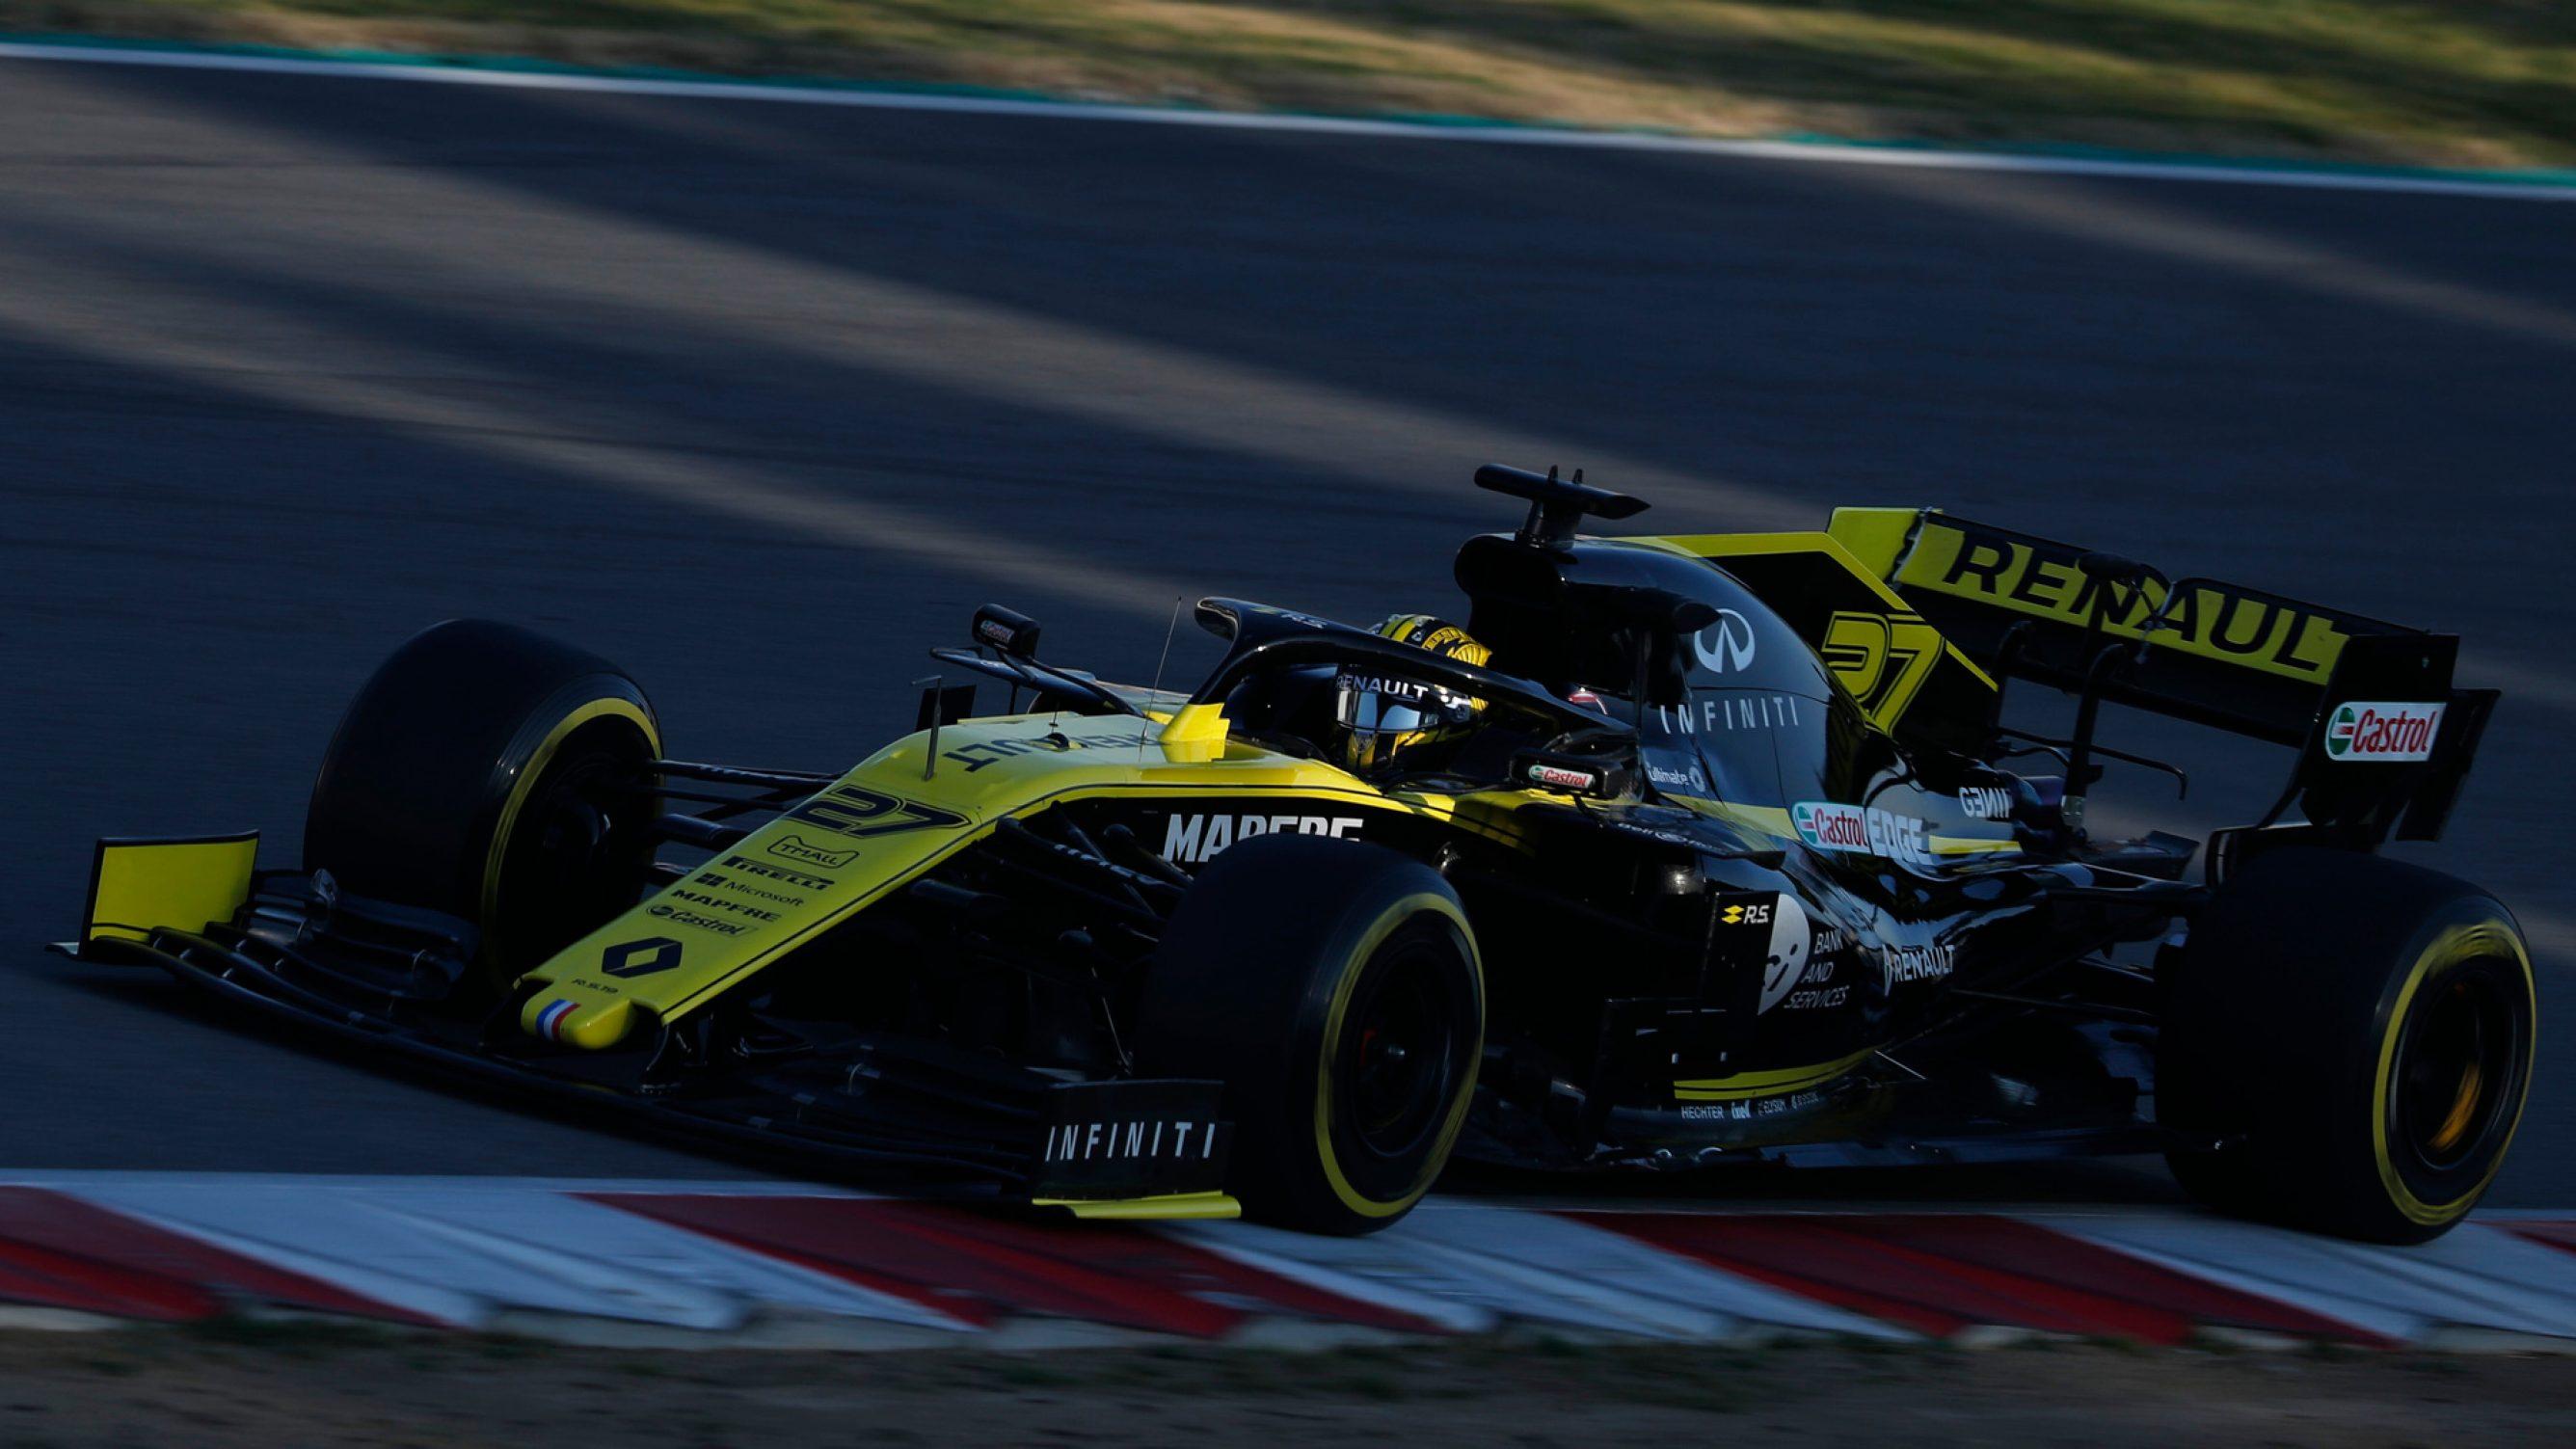 2019_F1_testing_2_day_2_0033